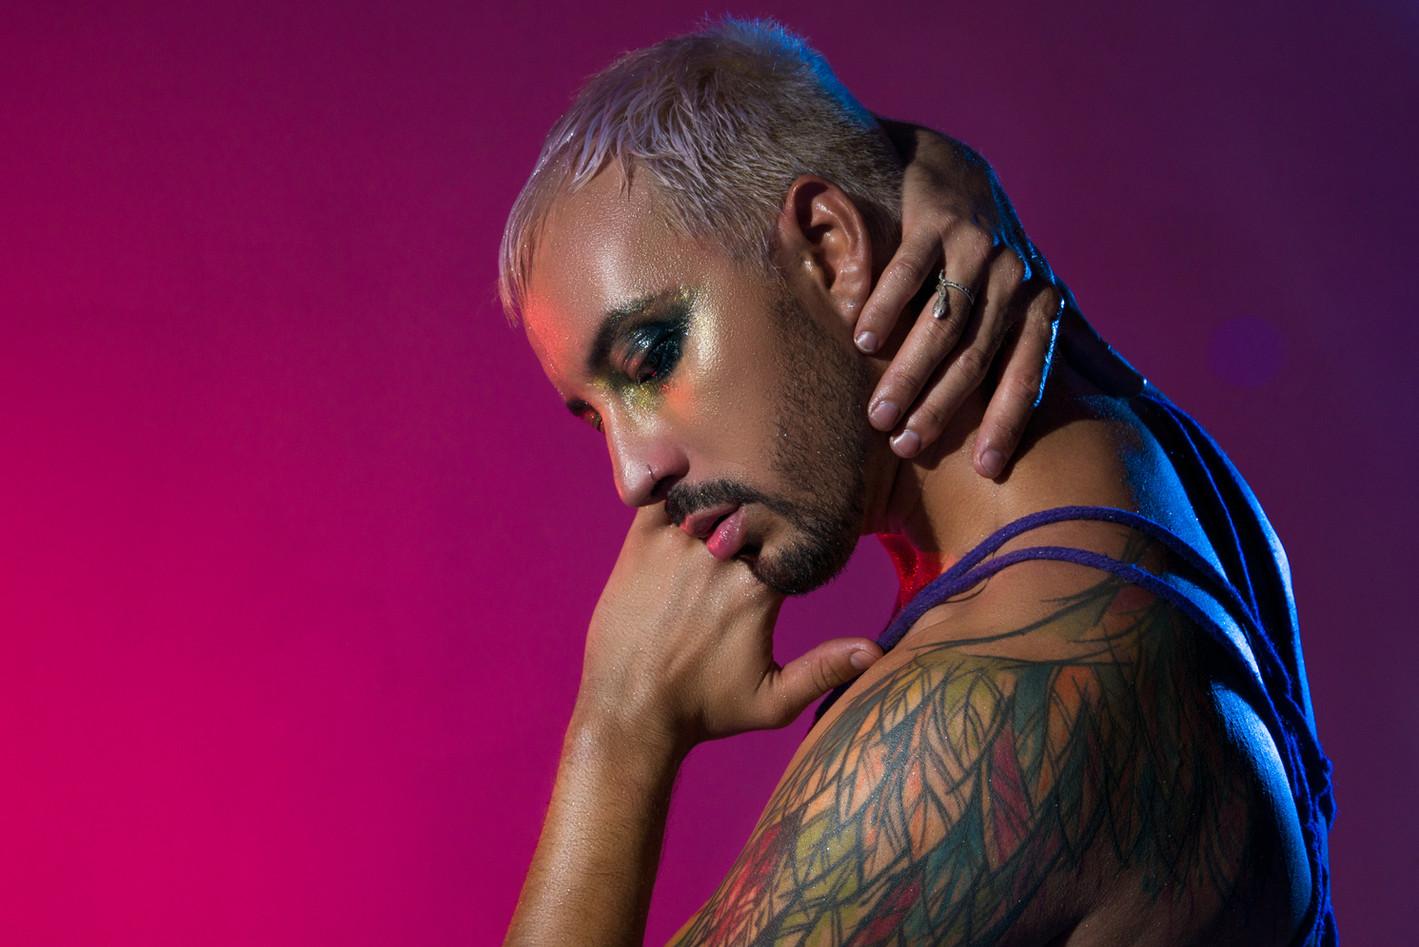 Joshua LGBT Portrait